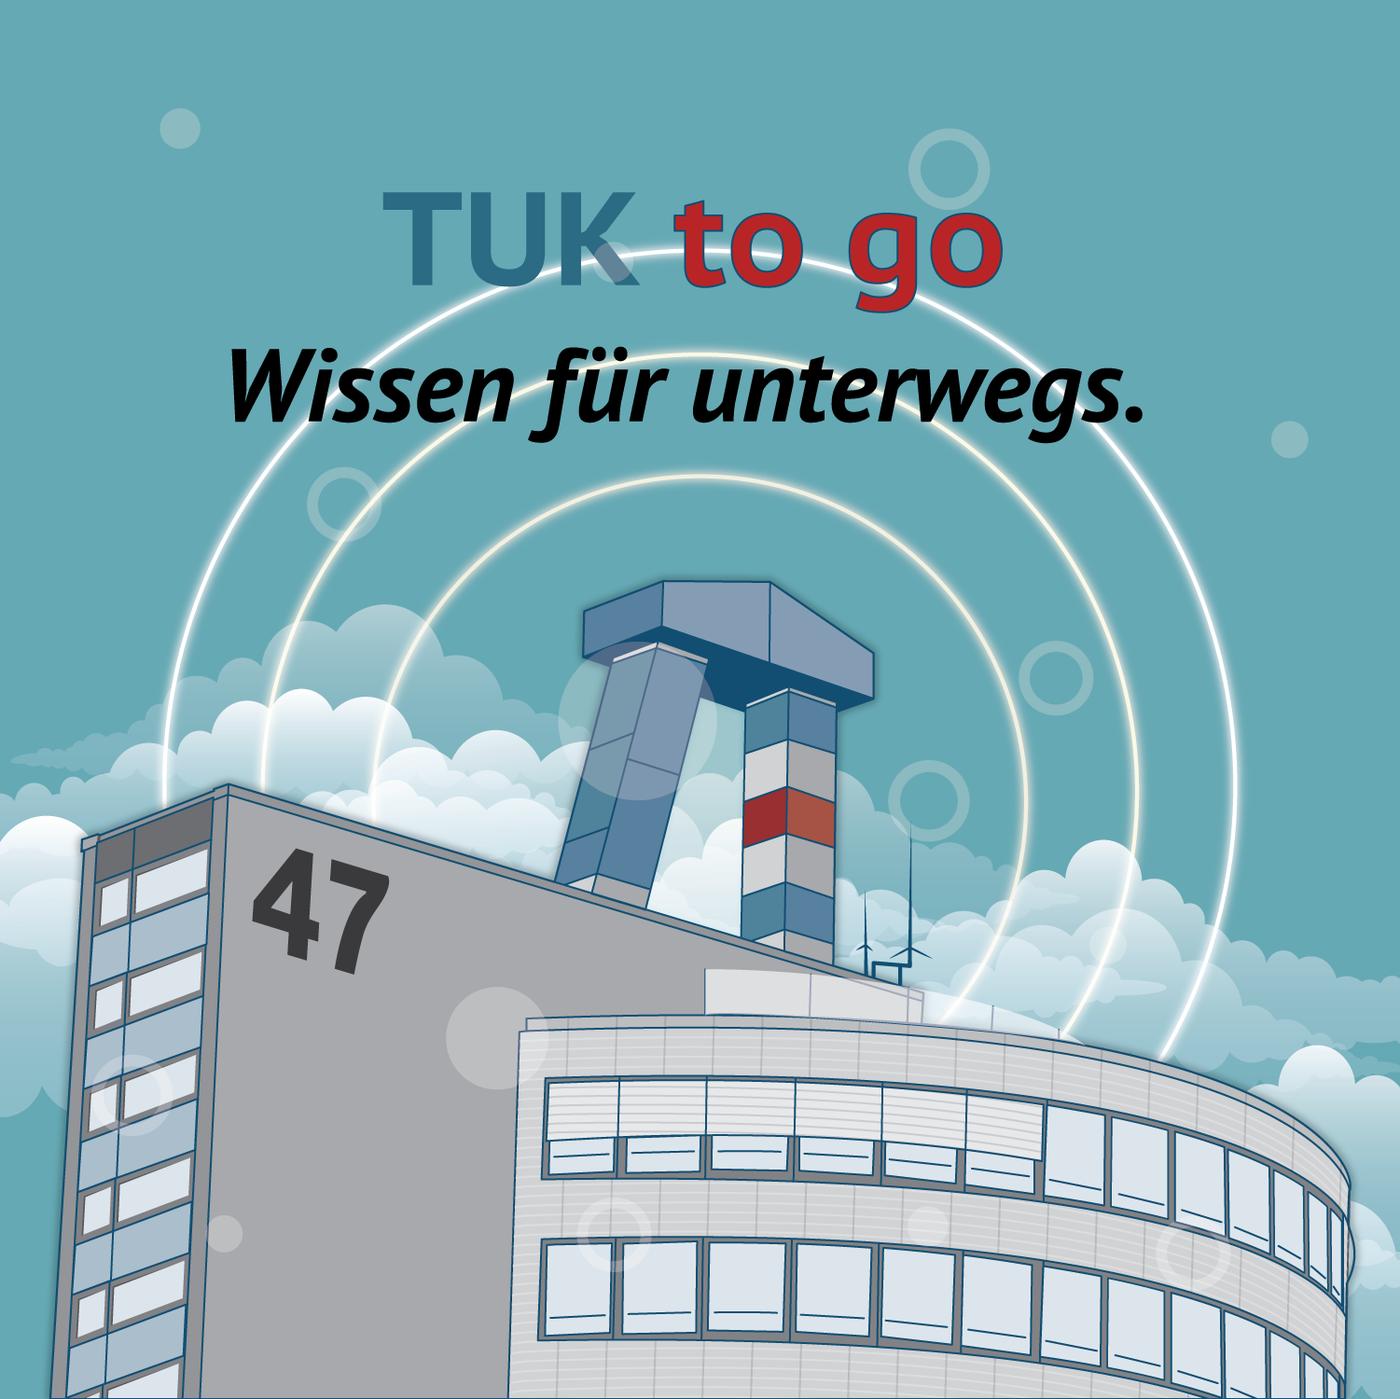 12 Schon gewusst:Christian de Schryver über Wipotec und Röntgeninspektionstechnik